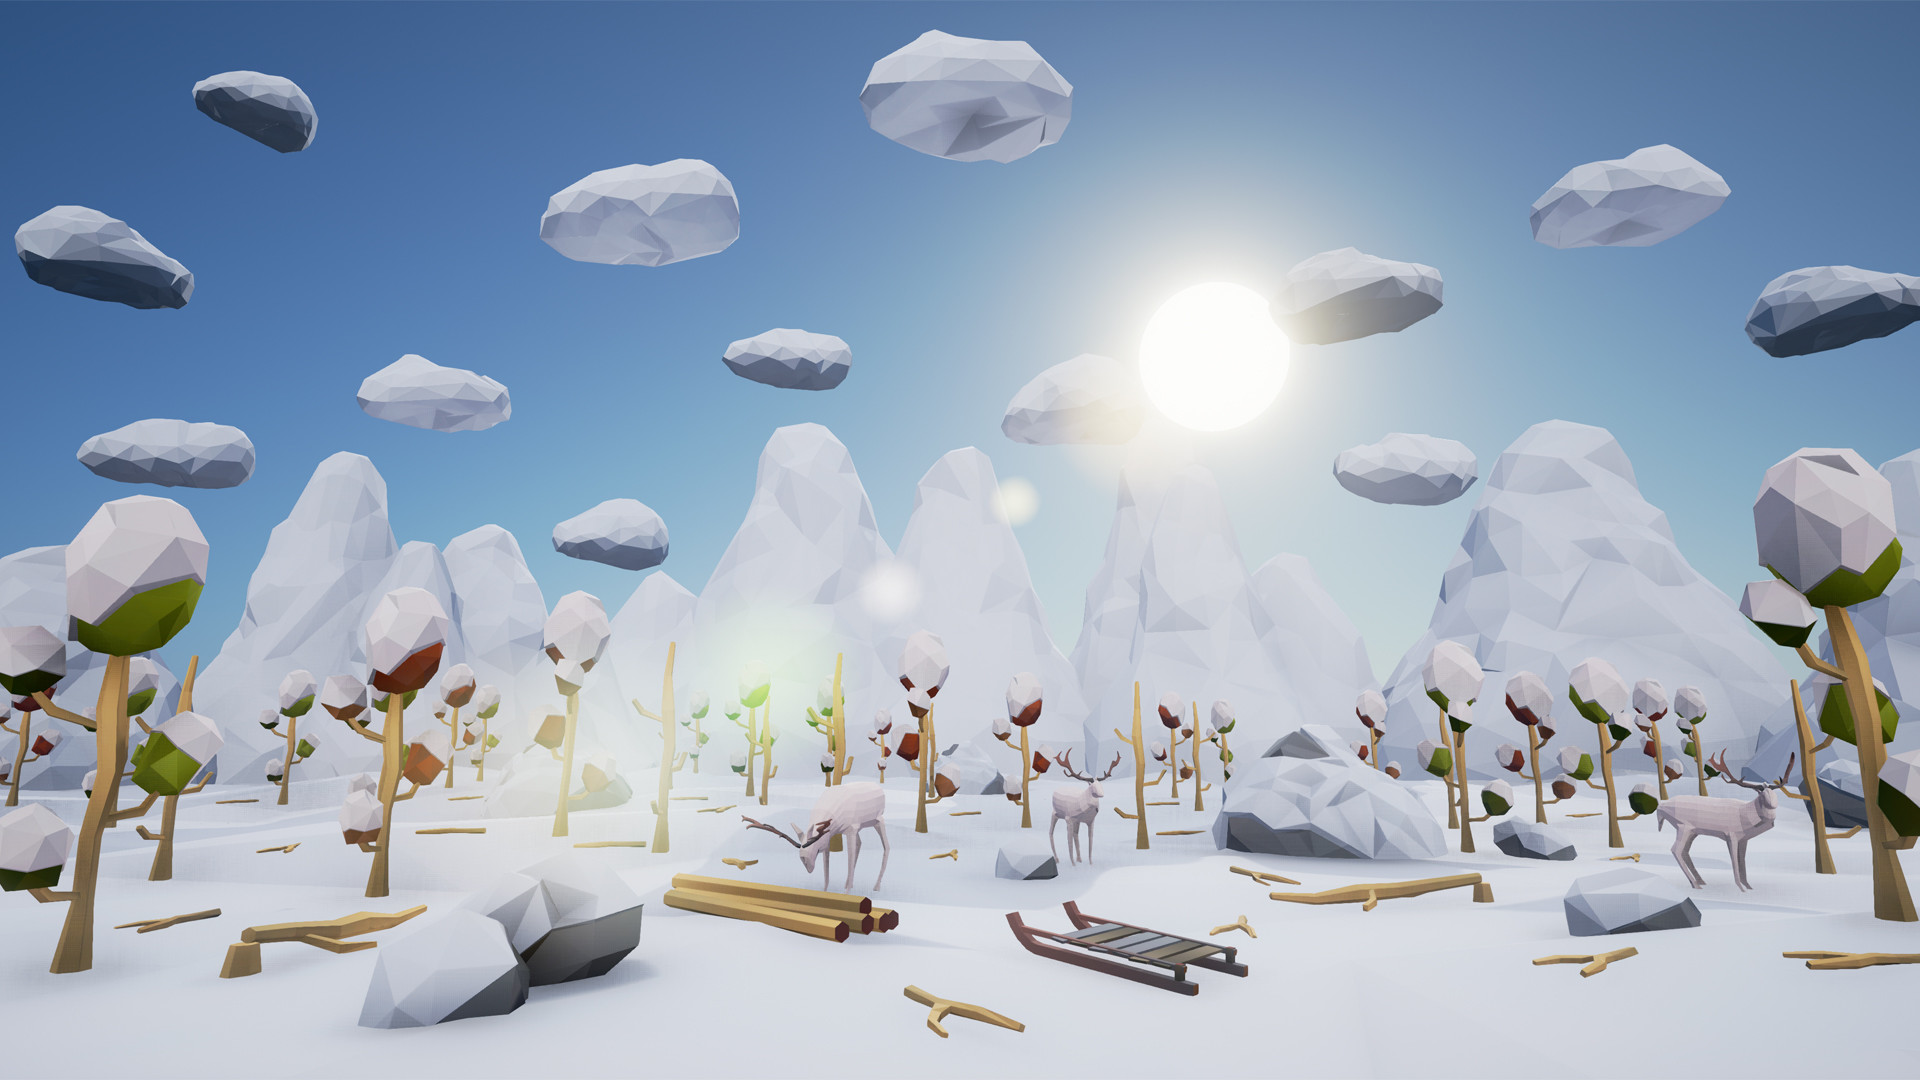 Unreal Engine 4 Screenshot_1